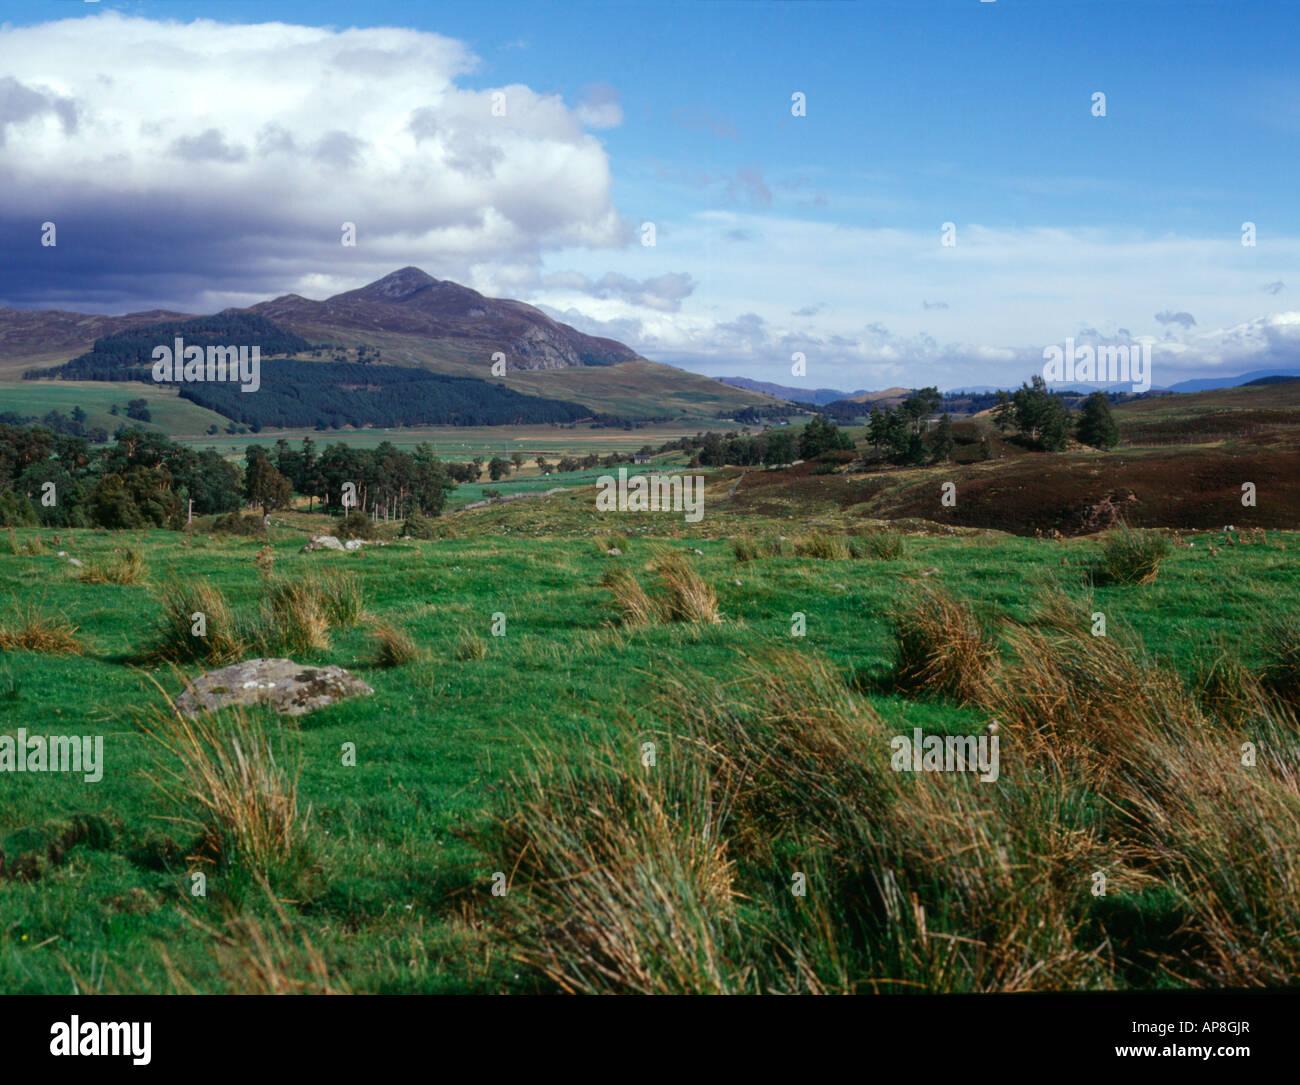 dh Monadhlaith mountains A CHAILLEACH INVERNESSSHIRE Wild Mountain glen wilderness scotland scottish landscape mountain beautiful Stock Photo